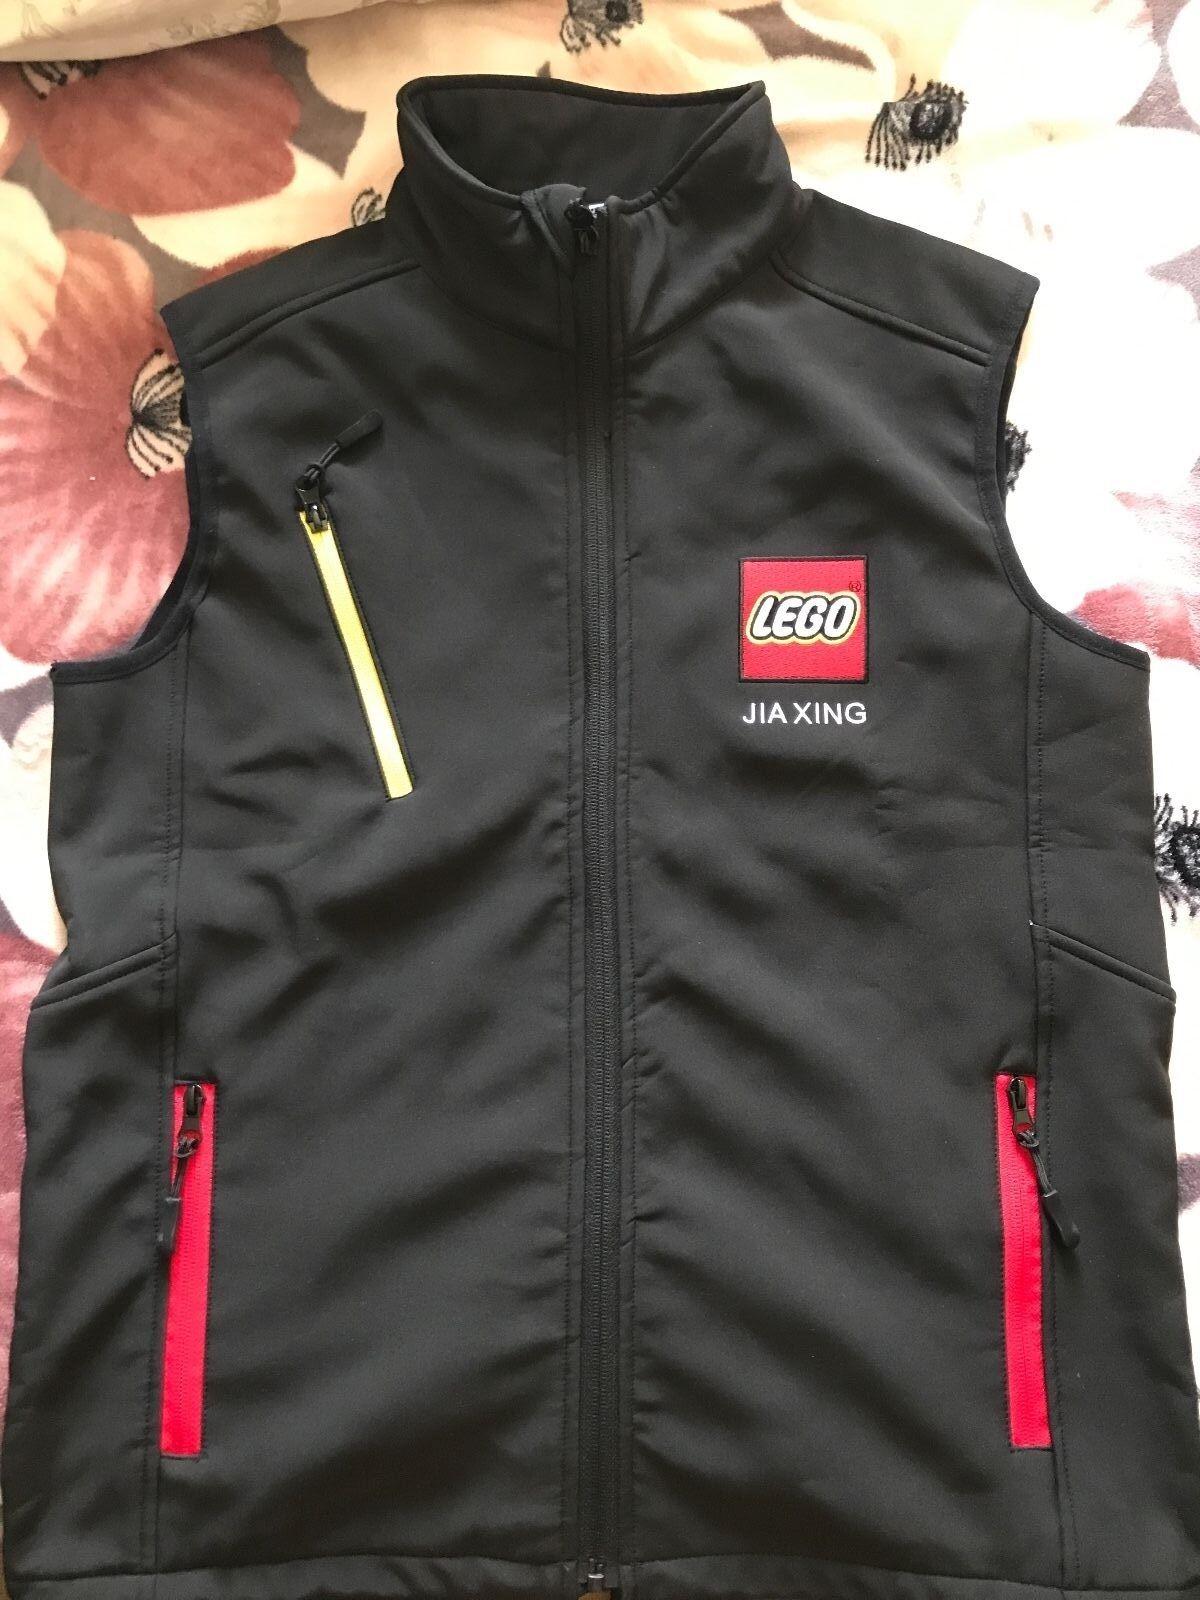 RARE LEGO 2016 Jiaxing Factory ouverture Veste sans manches  NOT FOR SALE